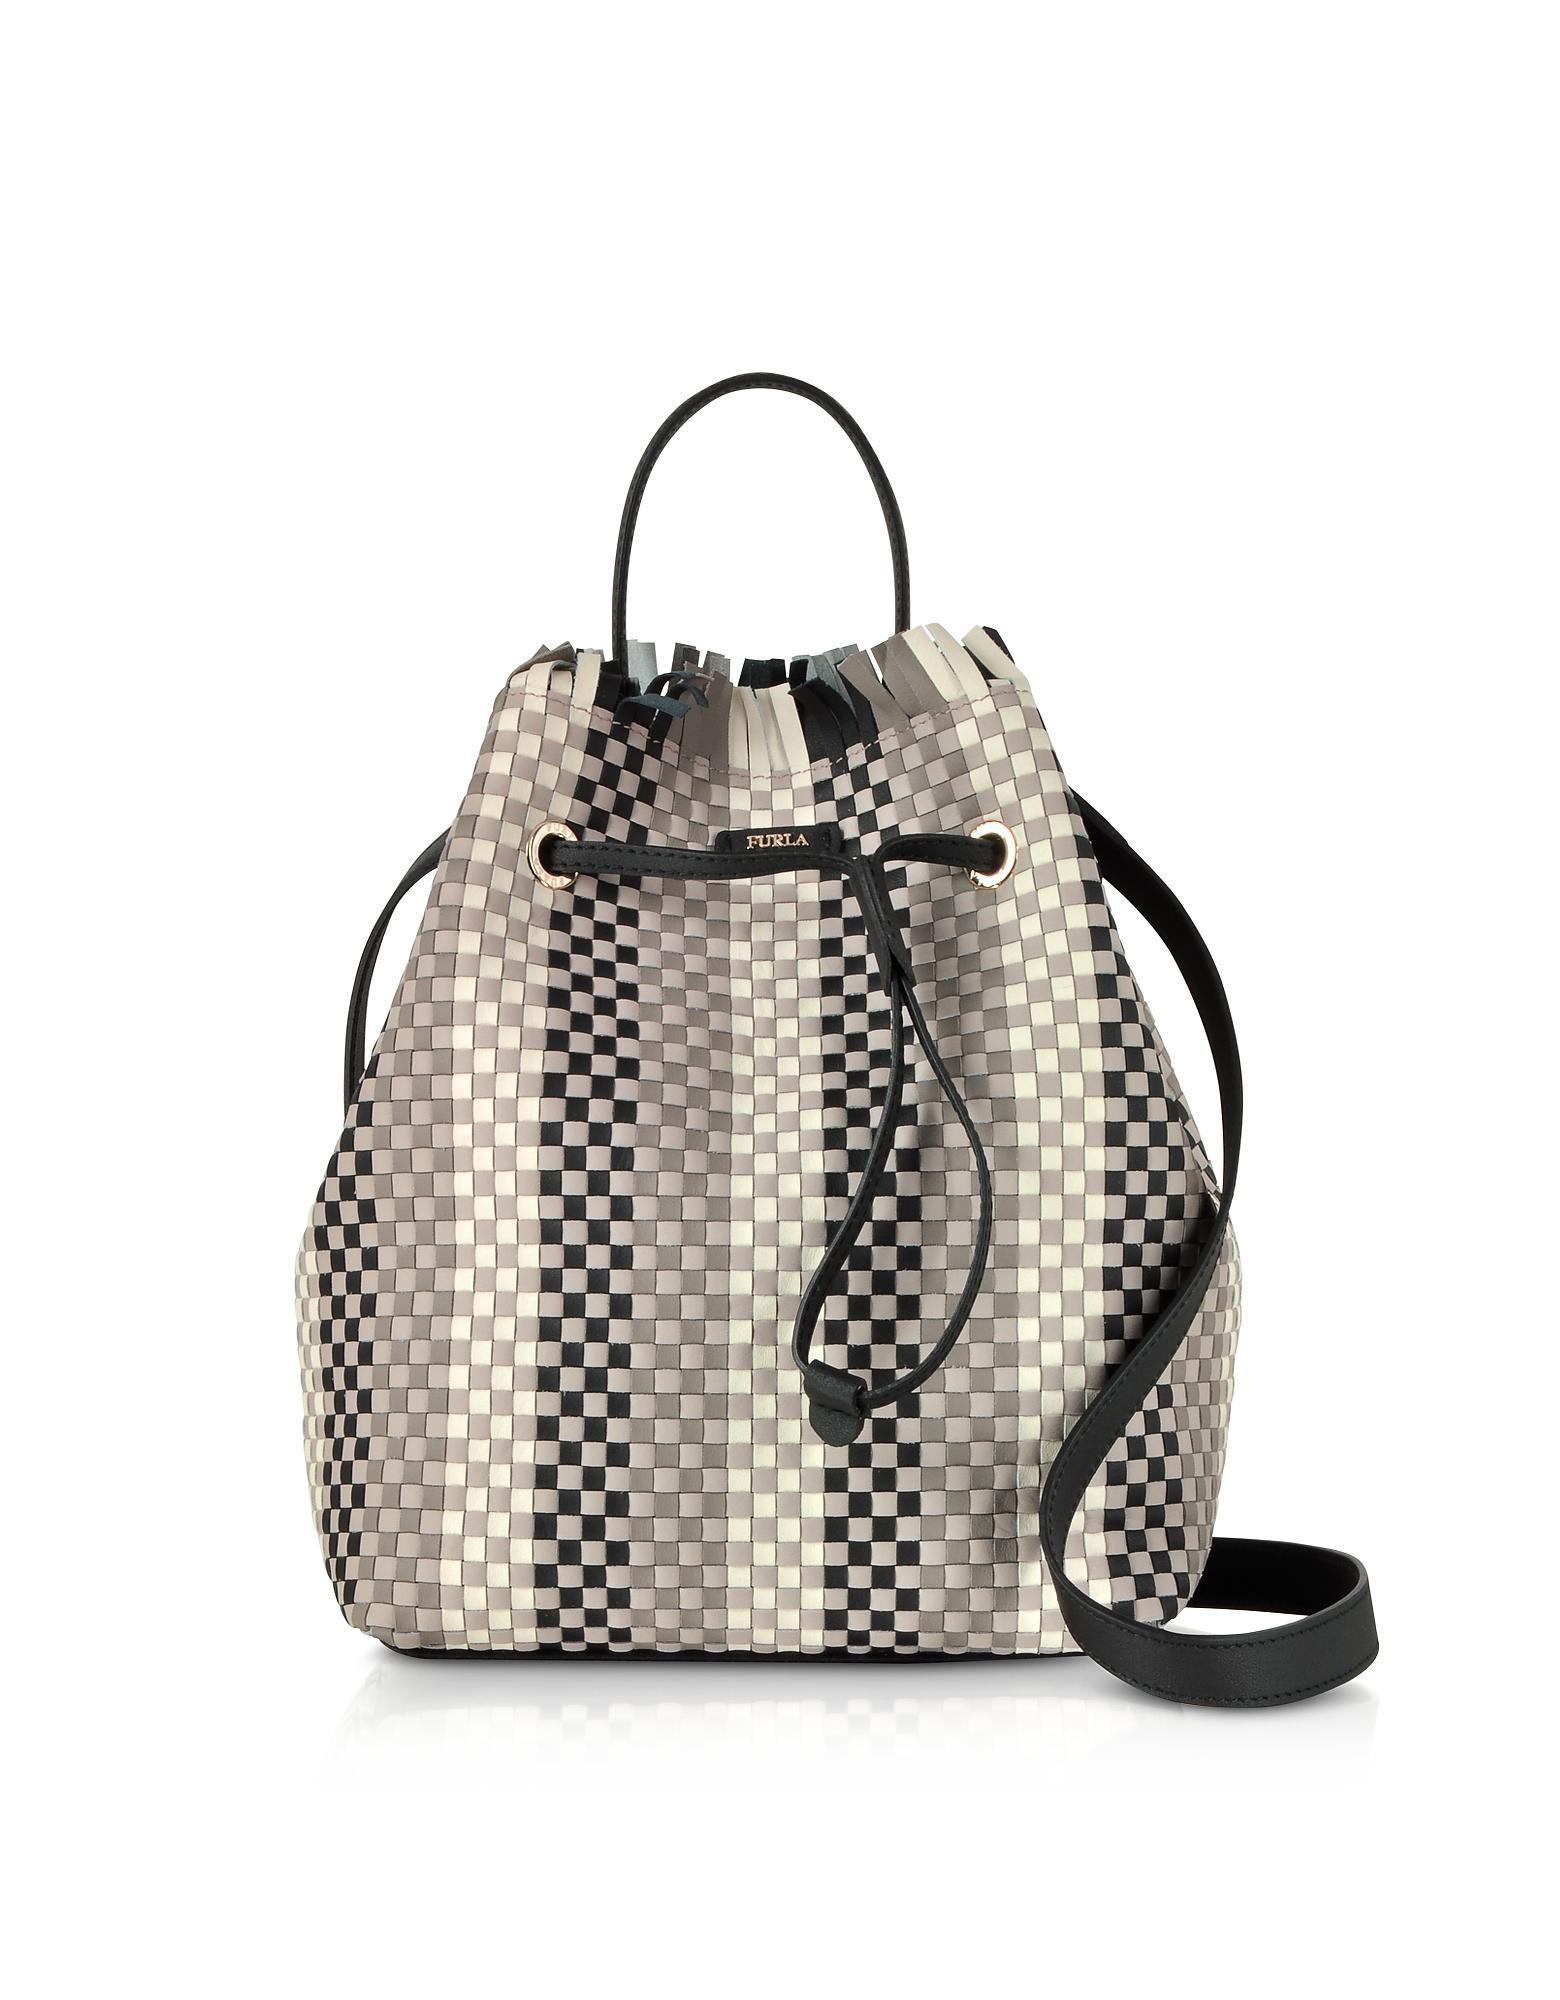 Stacy Casanova Small Drawstring Bag in Onyx and Petalo Calfskin Furla Rtci7574y